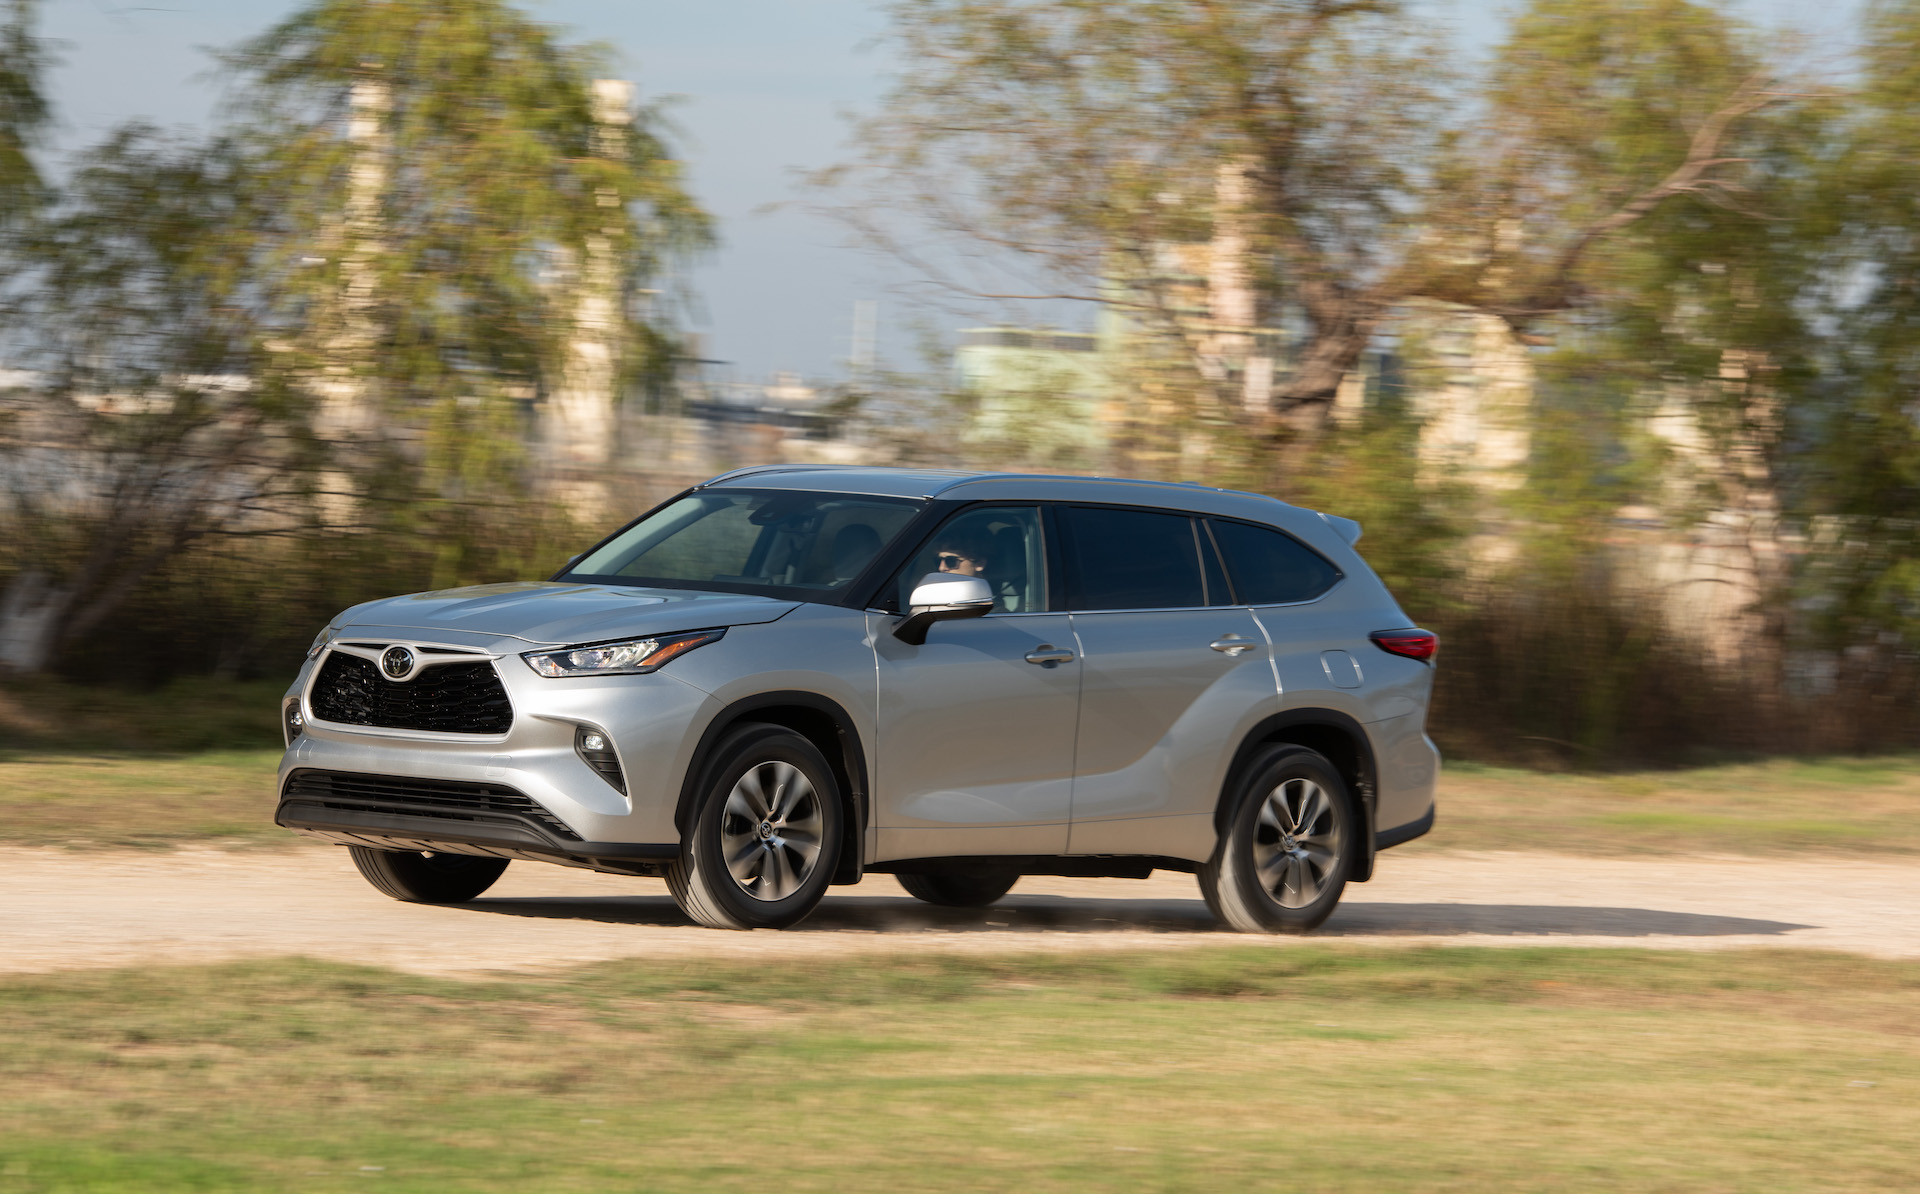 Car Prices 2020 Toyota Highlander Debuts At 35 720 Tops